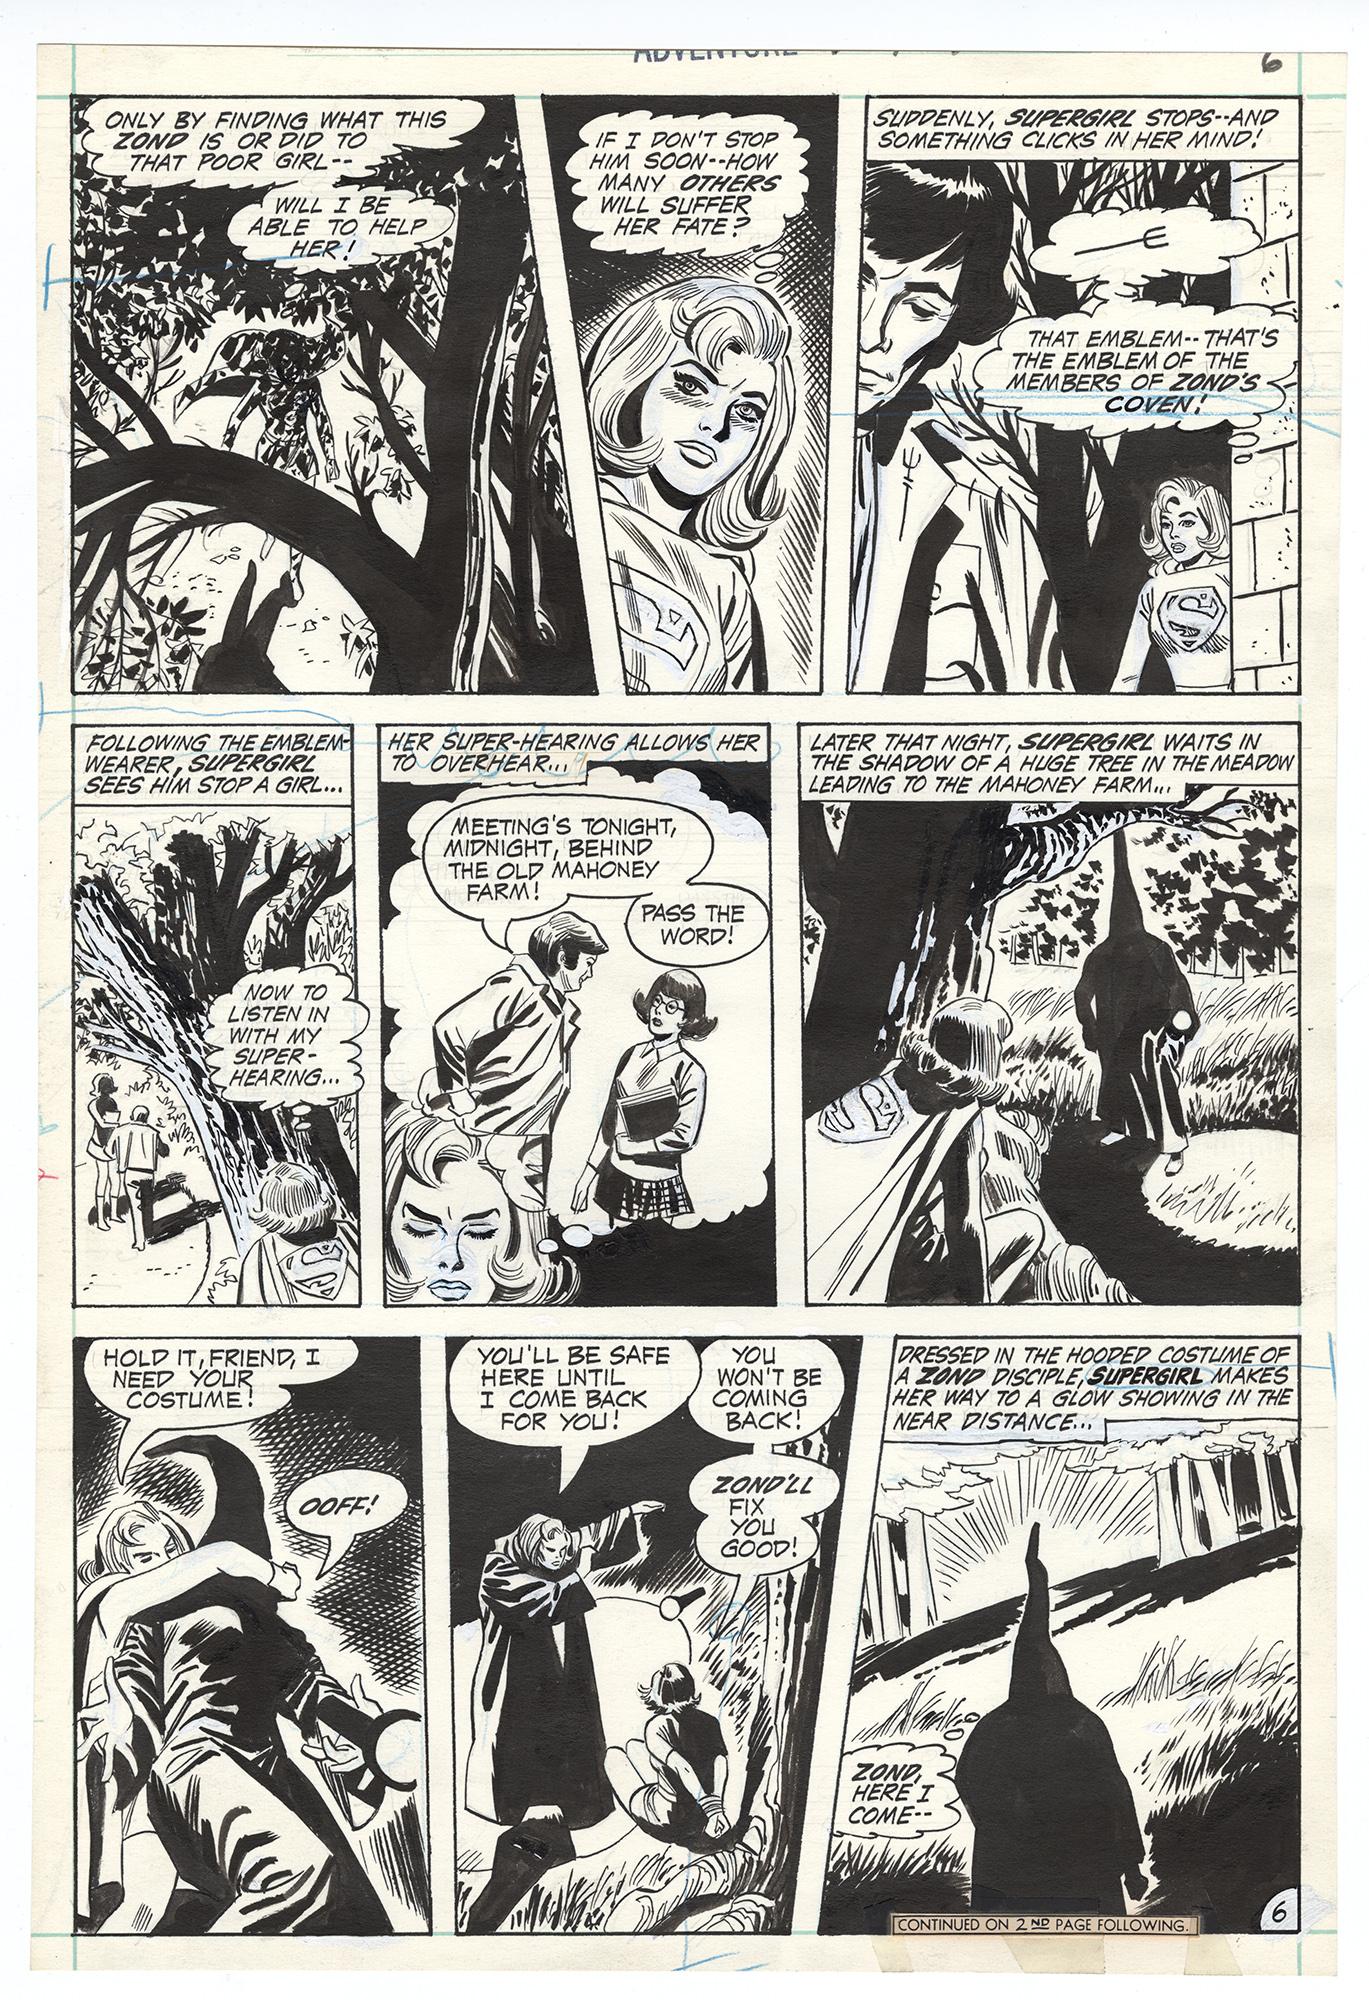 Adventure Comics #397 p6